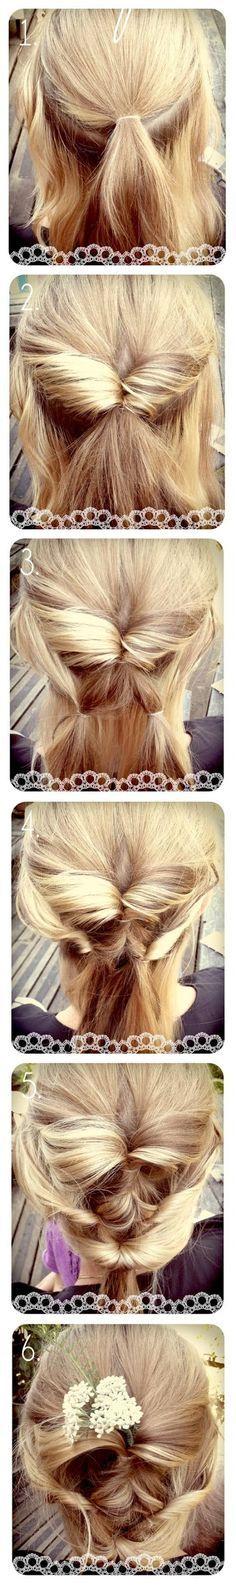 Make a Diy Wedding Hair | hairstyles tutorial